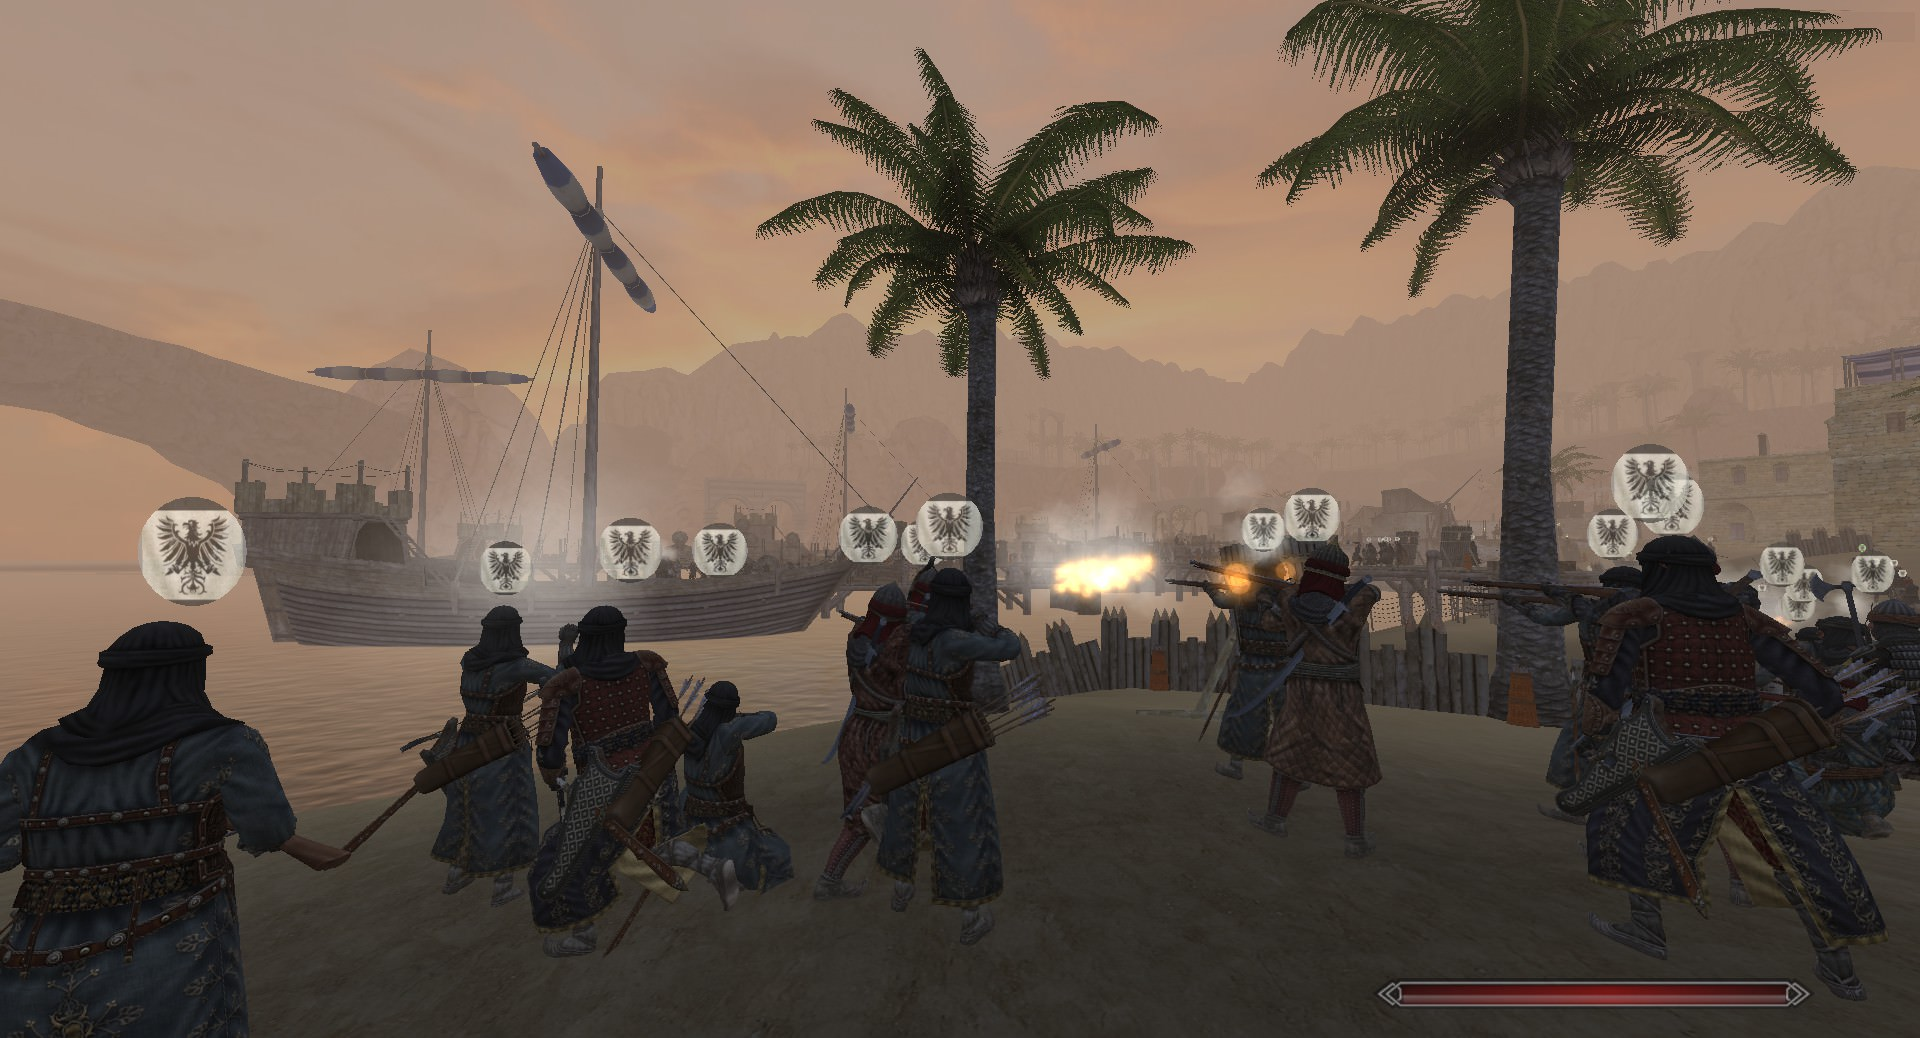 Saracen troops in Full Invasion